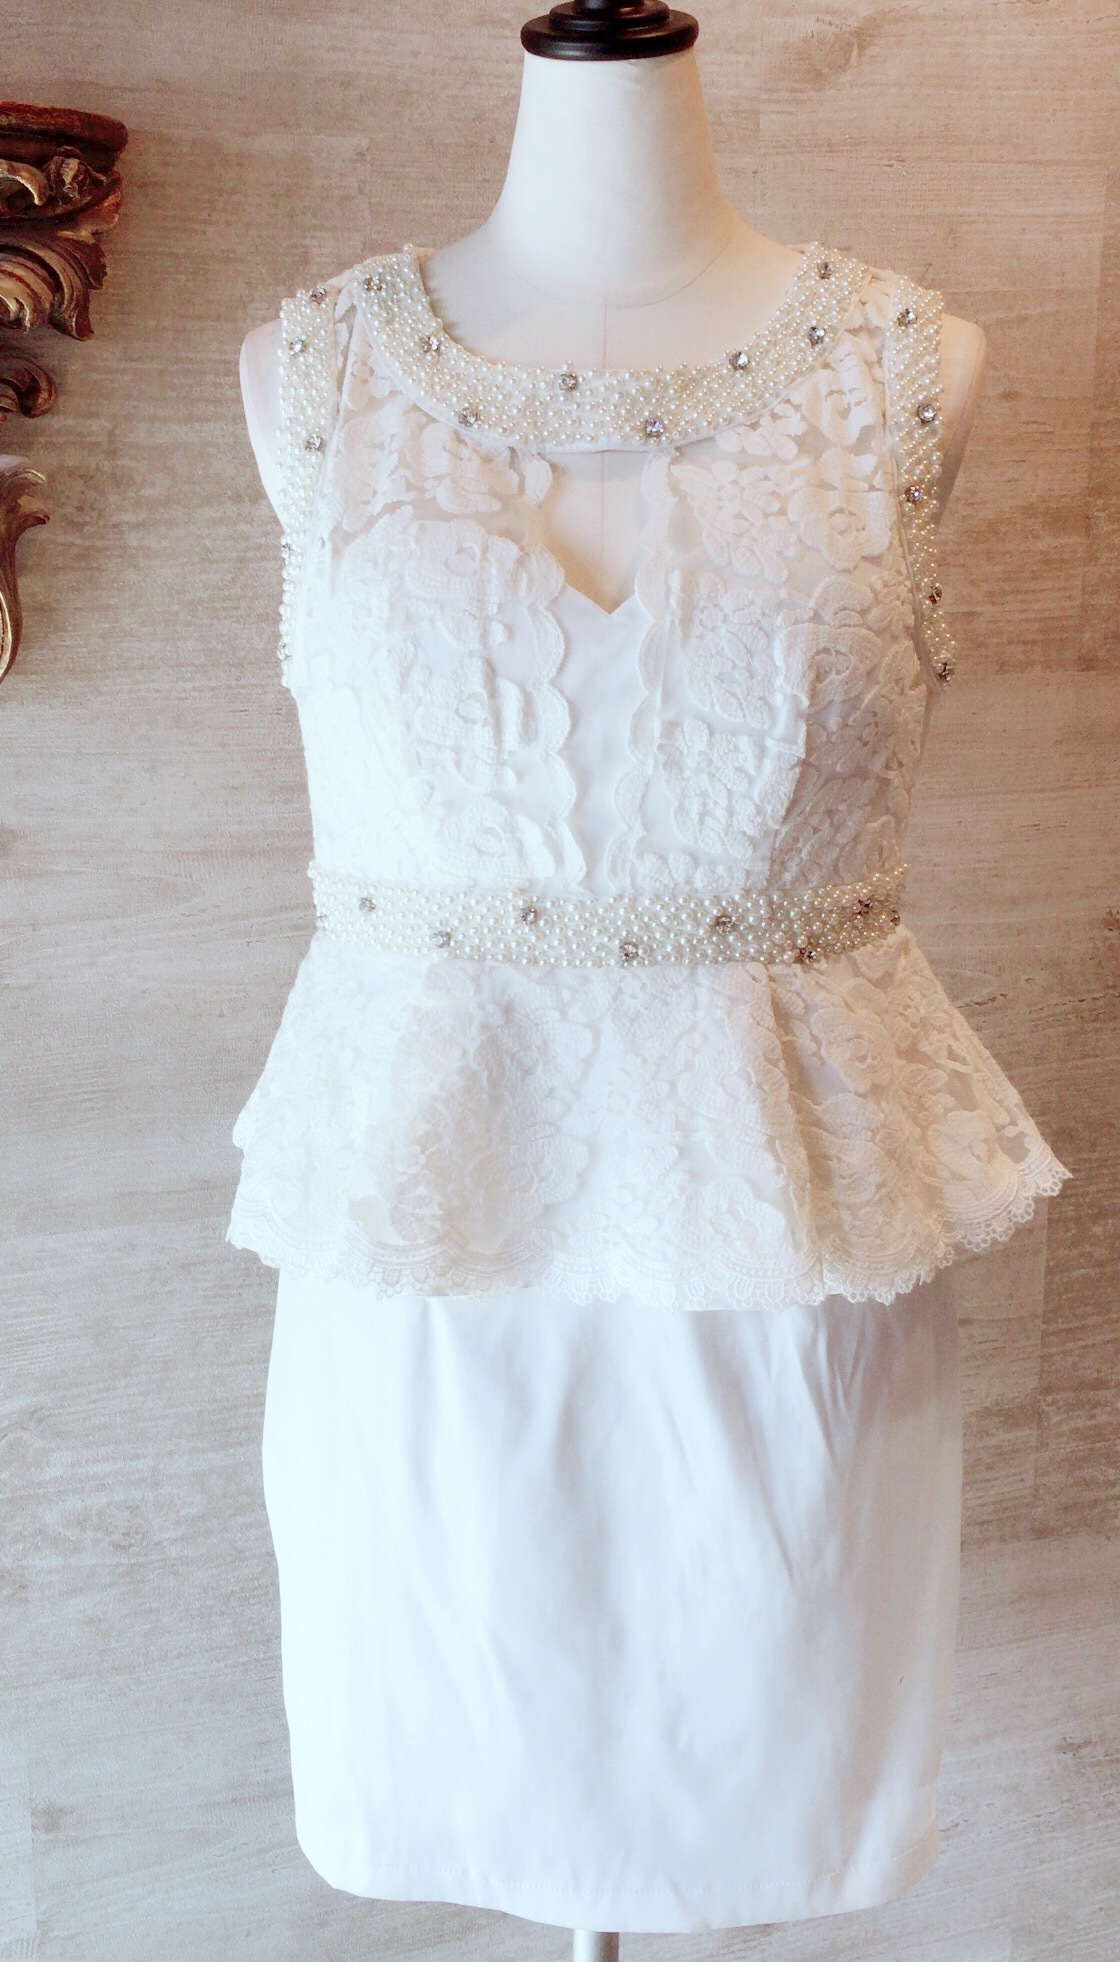 【ROSES OUTLET】コットンレースぺプラムドレス